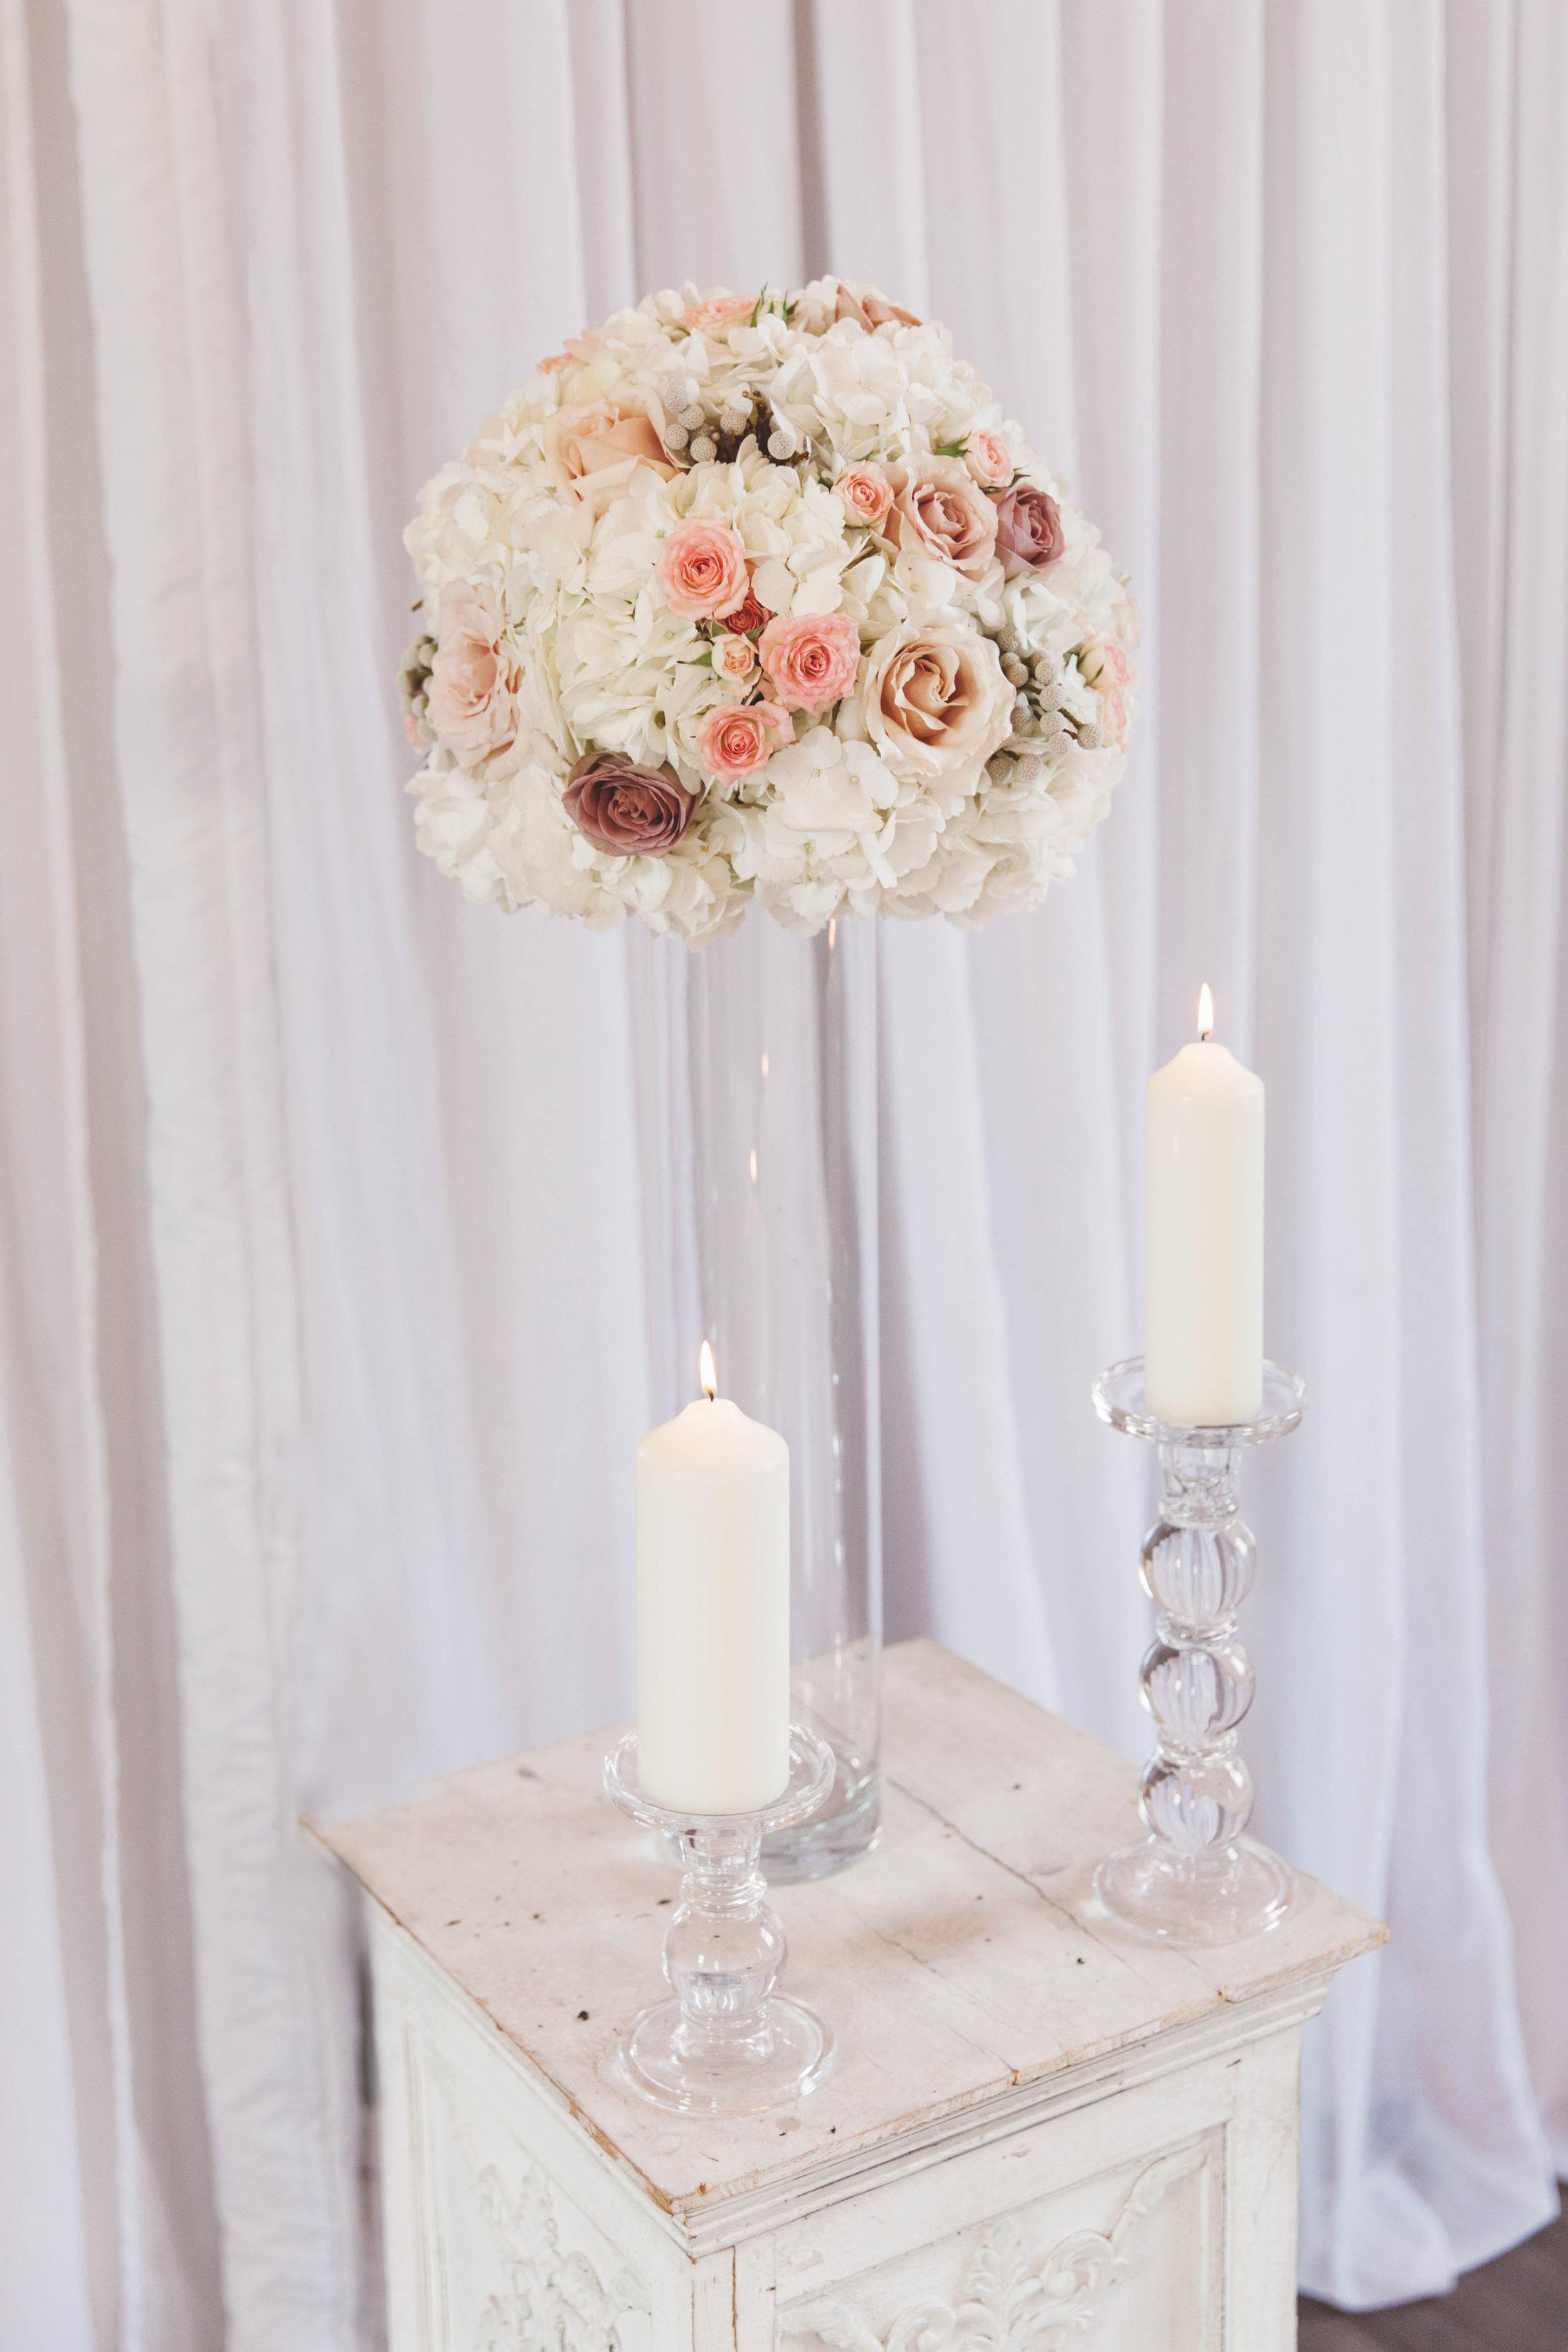 Soft pink and Hydrangea wedding floral displays at amalfi white, by award winning Derbyshire florist, Tineke